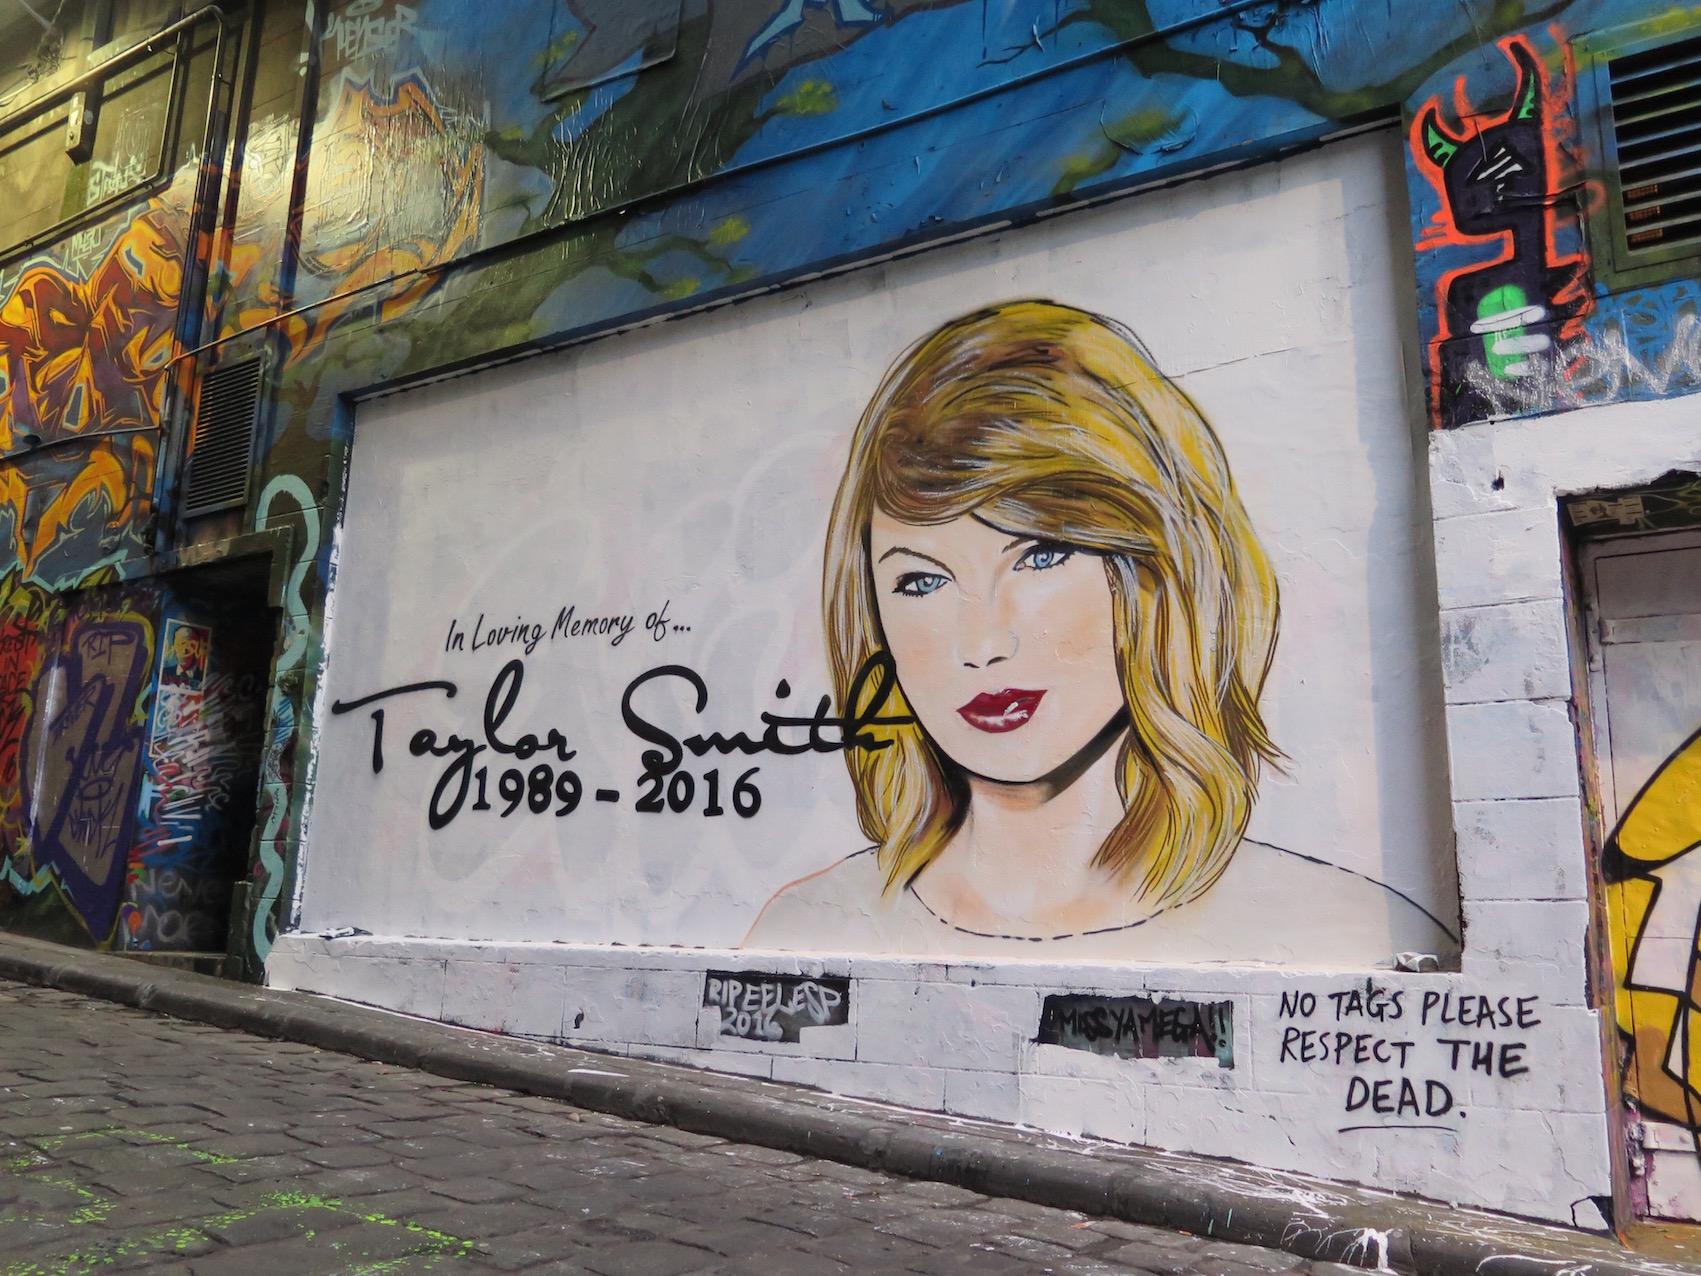 deansunshine_landofsunshine_melbourne_streetart_graffiti_Lush celebrity hosier lane 1 taylor swift 1